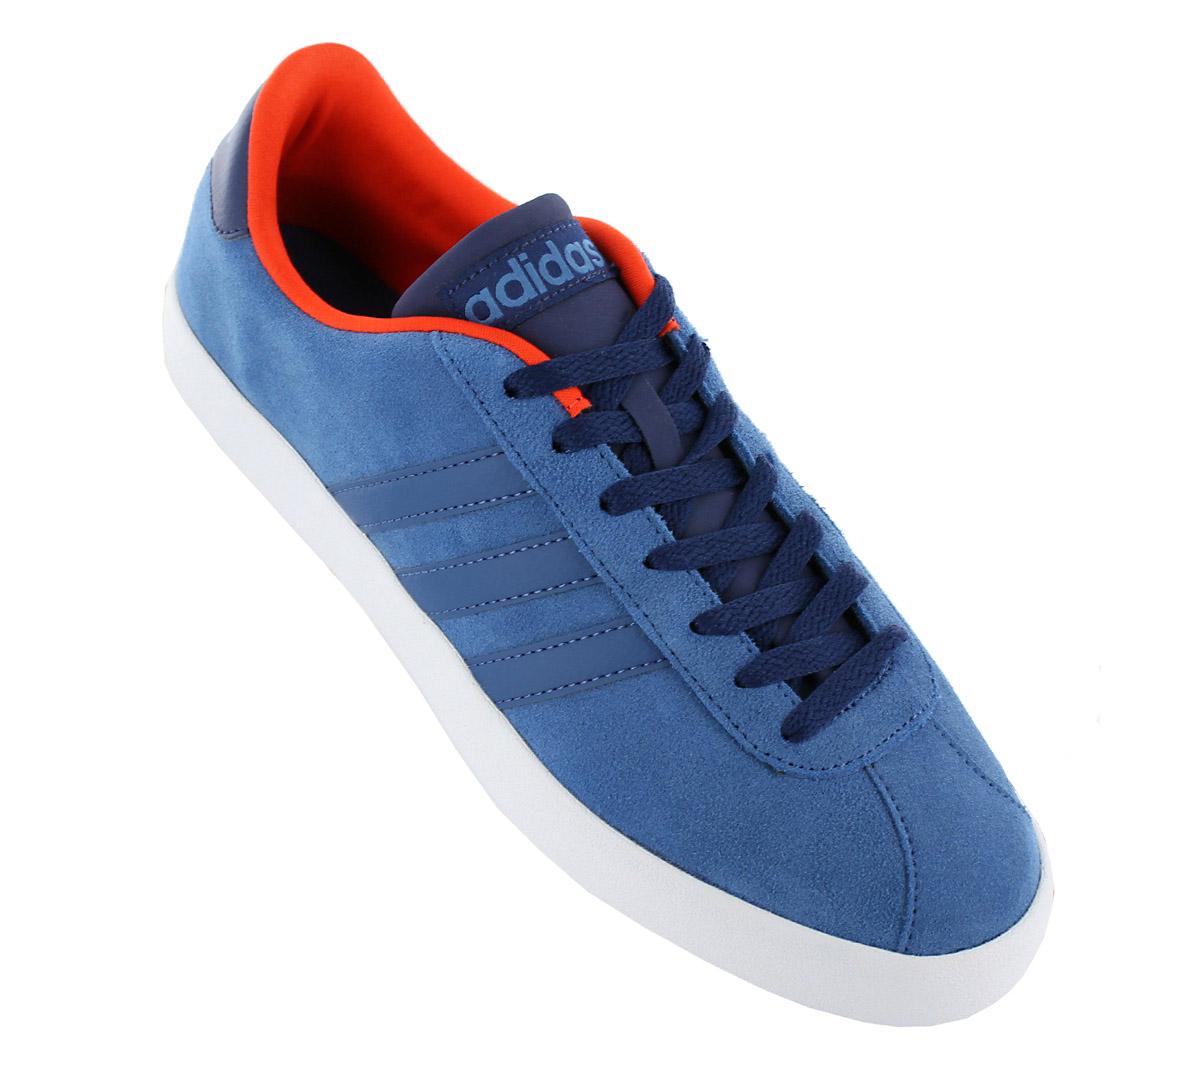 Adidas VL Court Vulc M AW3963 shoes